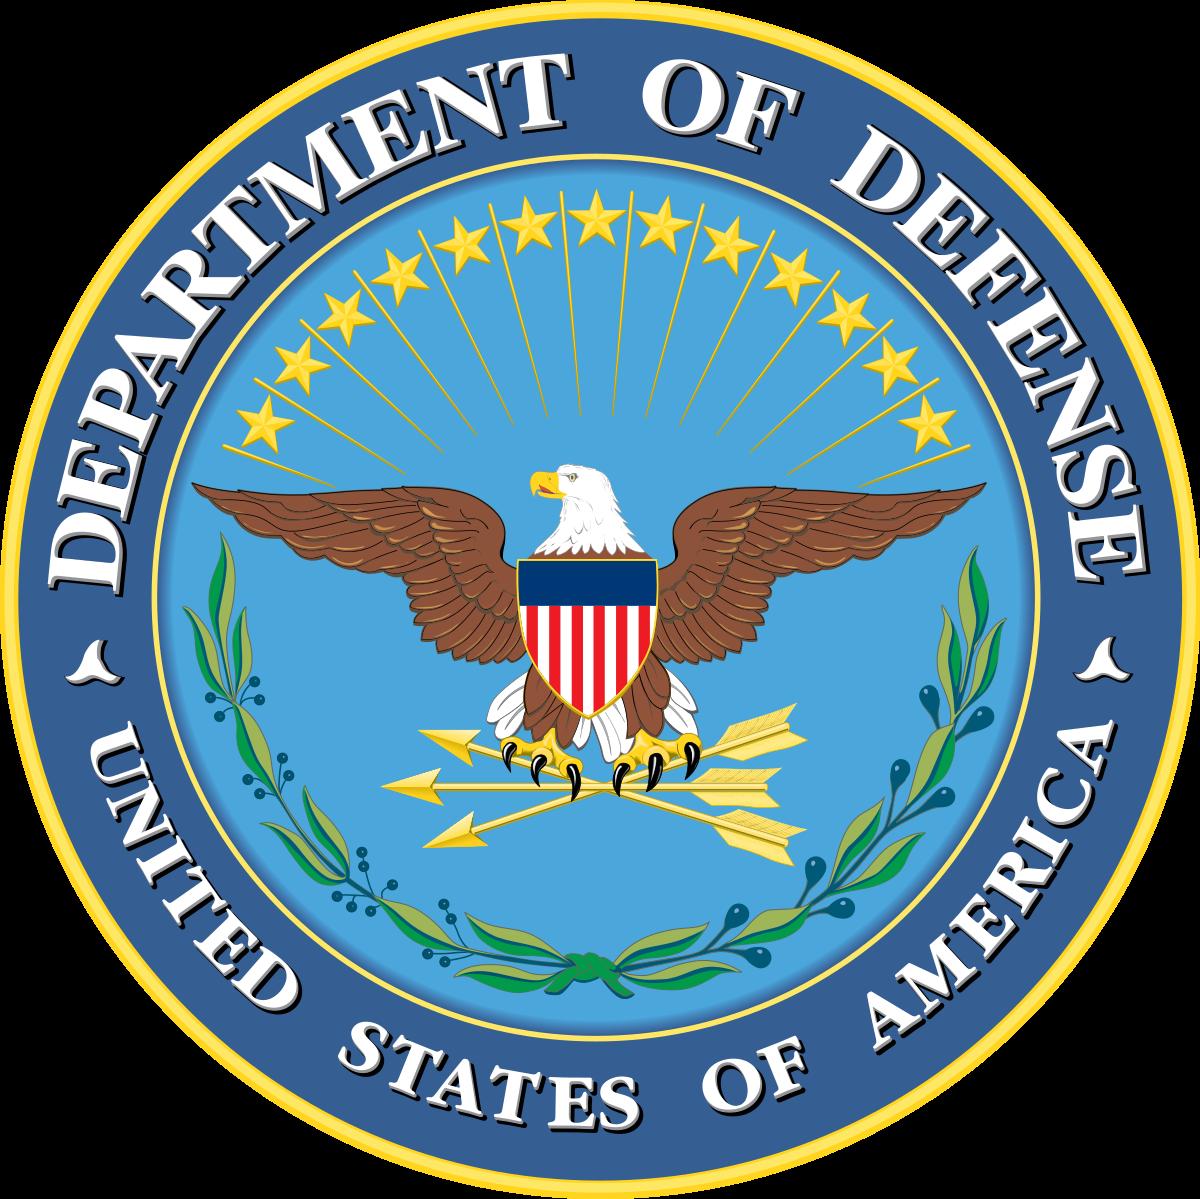 Pentagon Denies Plans to Classify FYDP Budget Info